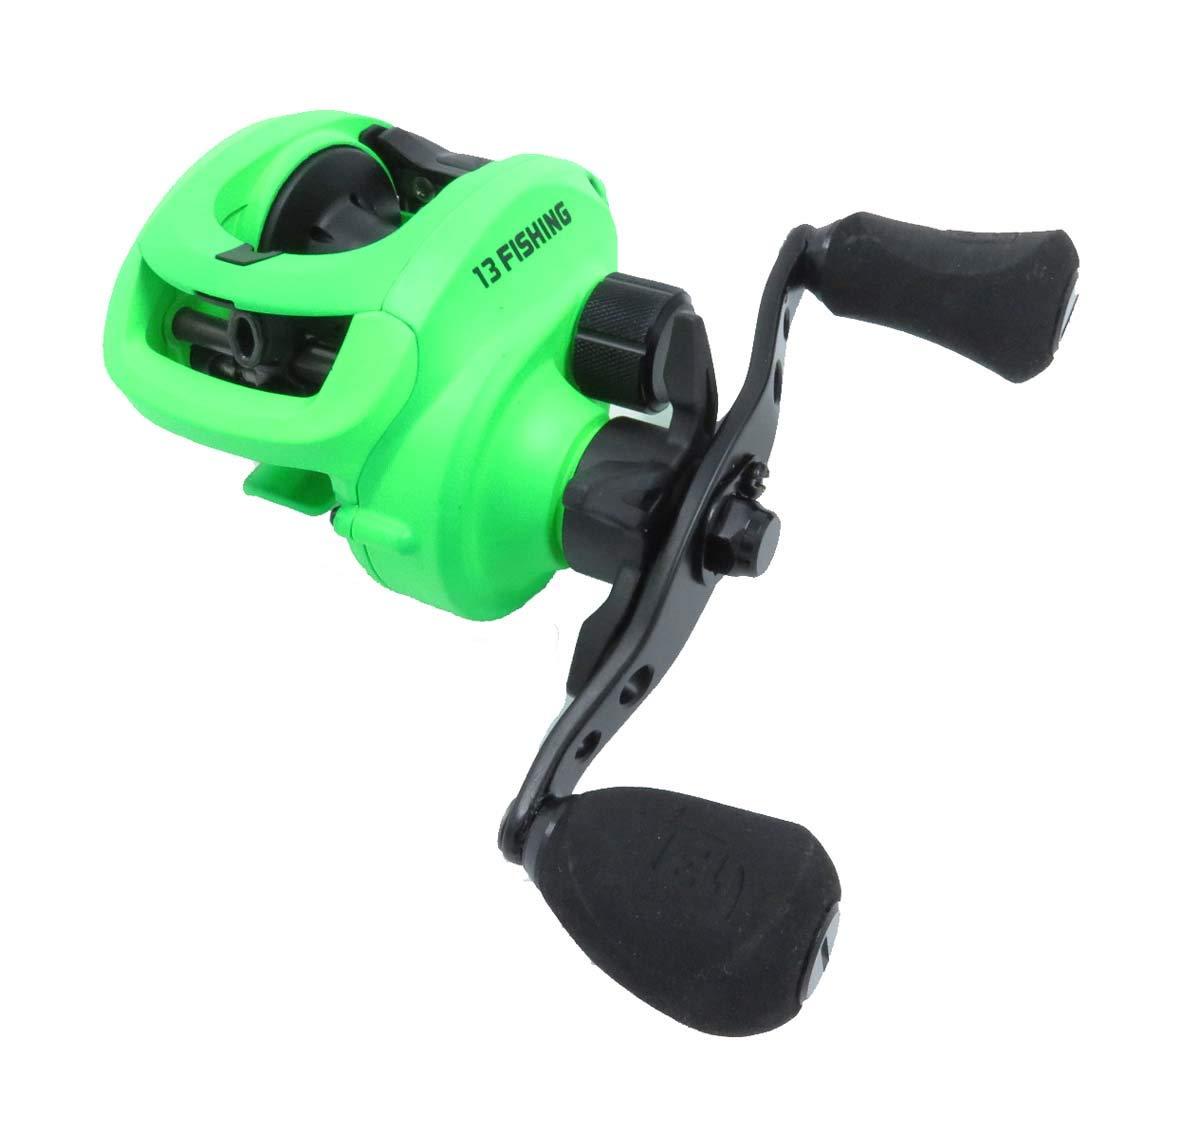 13 FISHING Inception Sport Z Inception Sport Z Baitcast Reel – 7.3 1 Gear Ratio – Left Handed Fresh Salt ,